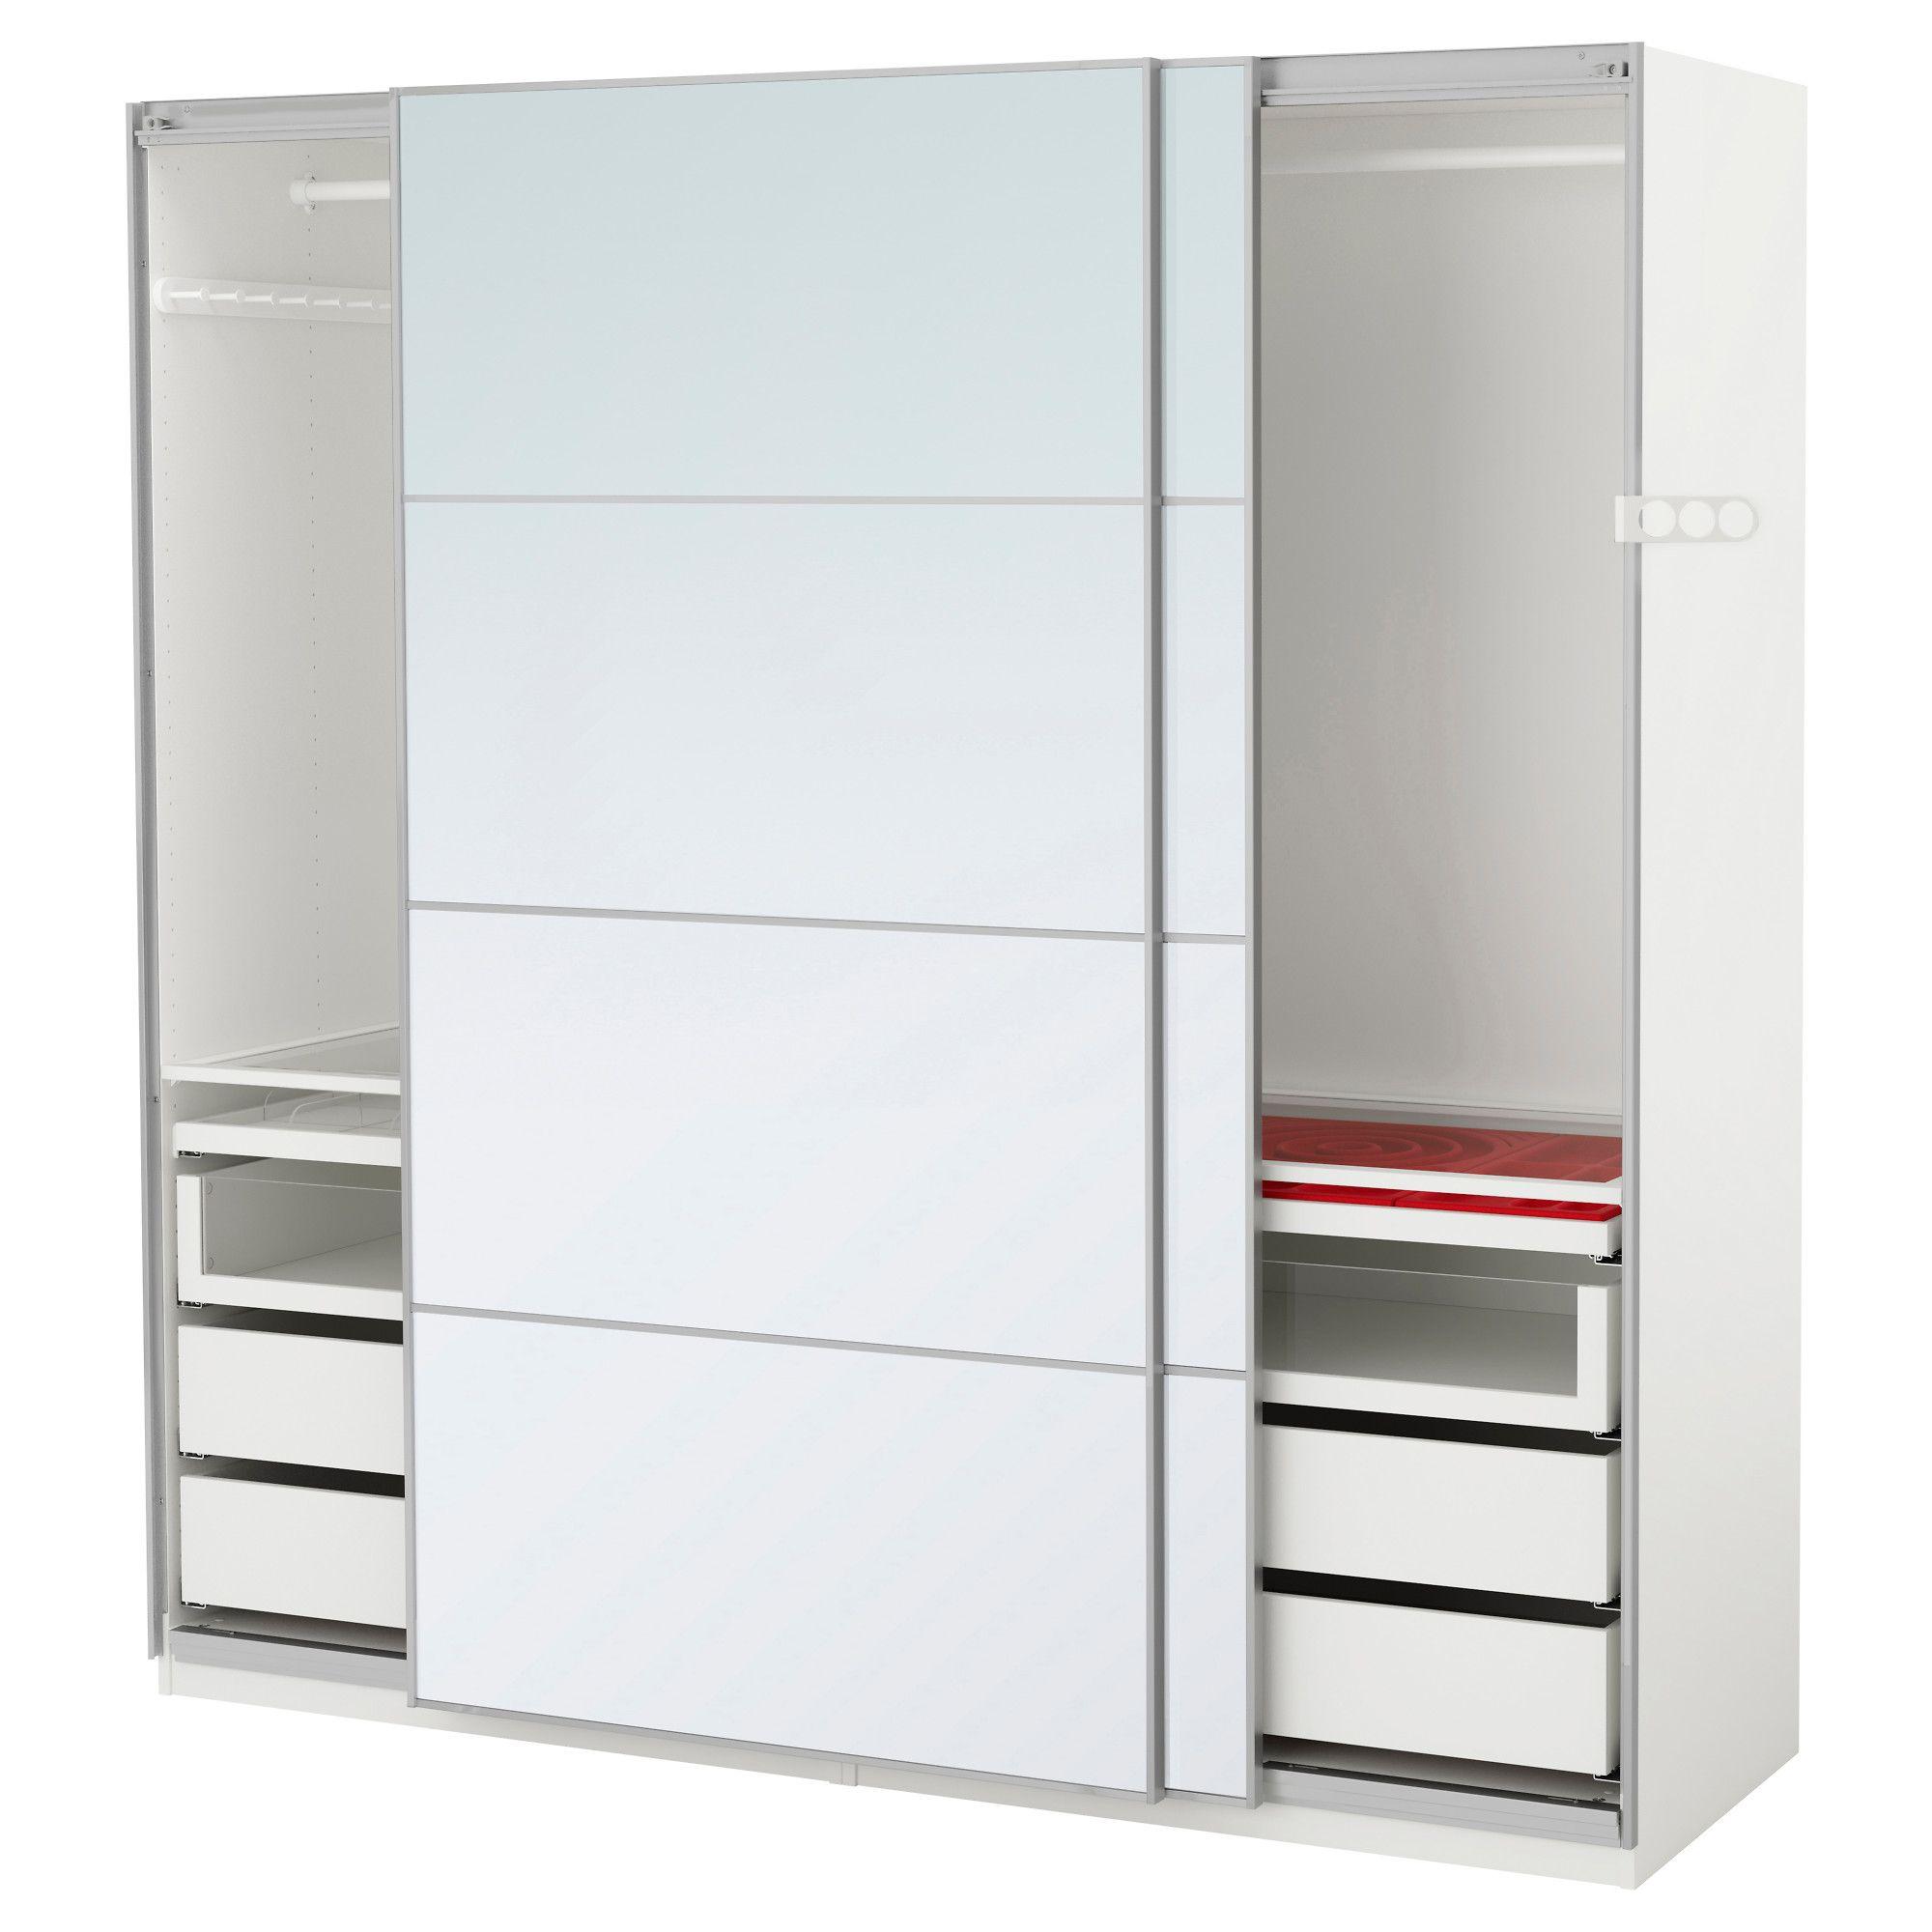 Pax Vaatekaappi 200x66x201 Cm Oven Vaimennin Ikea Storage  ~ Organizacion De Armarios Empotrados